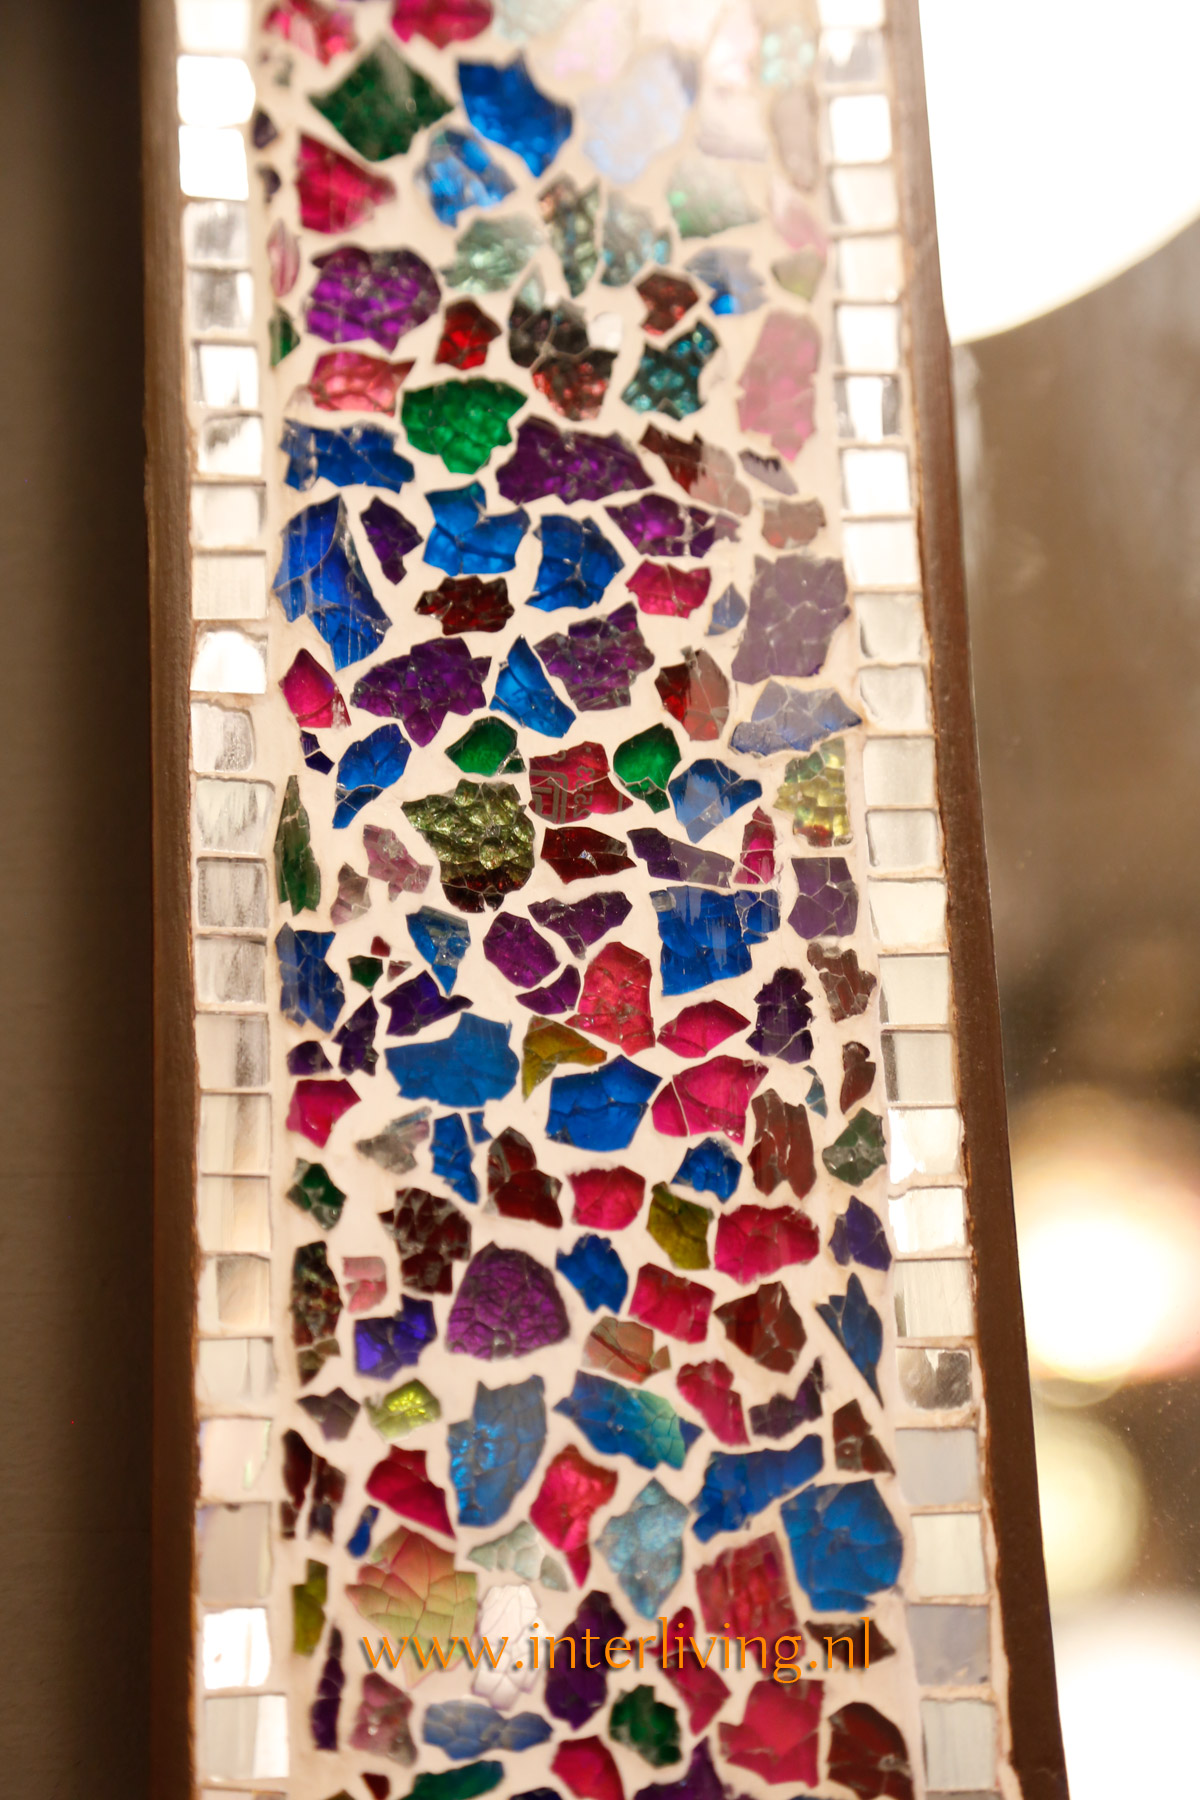 oosterse tuintafel - kleurrijke Marokkaanse stijl van tegelmozaïek